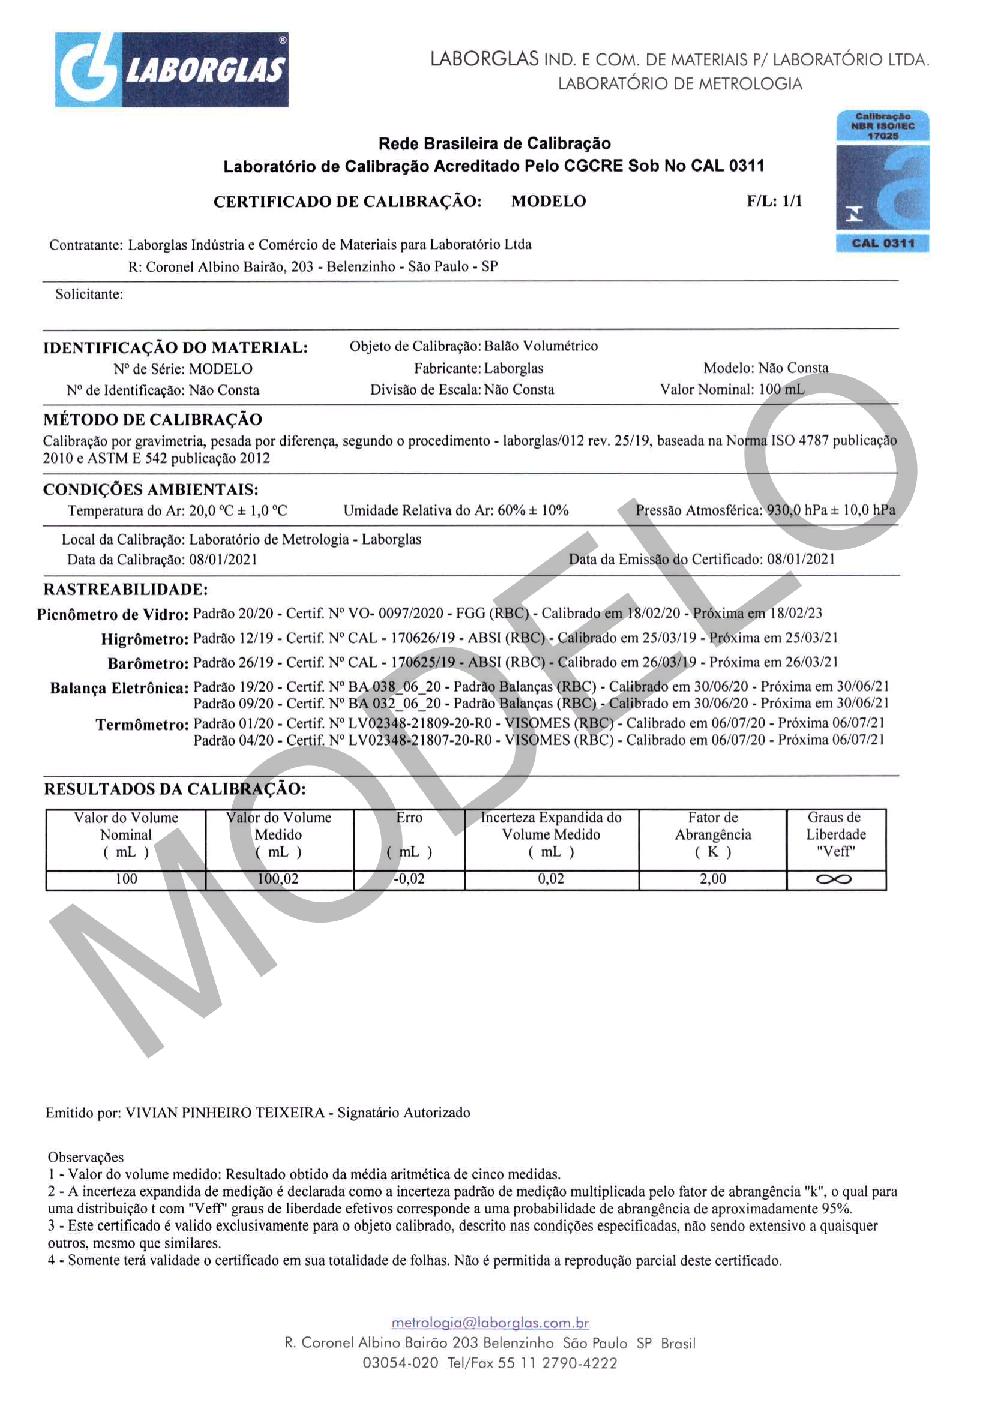 BALÃO VOLUMÉTRICO CLASSE A ROLHA POLI ÂMBAR C/ CERTIFICADO RBC 5 ML - Marca Laborglas - Cód. 91678076-R